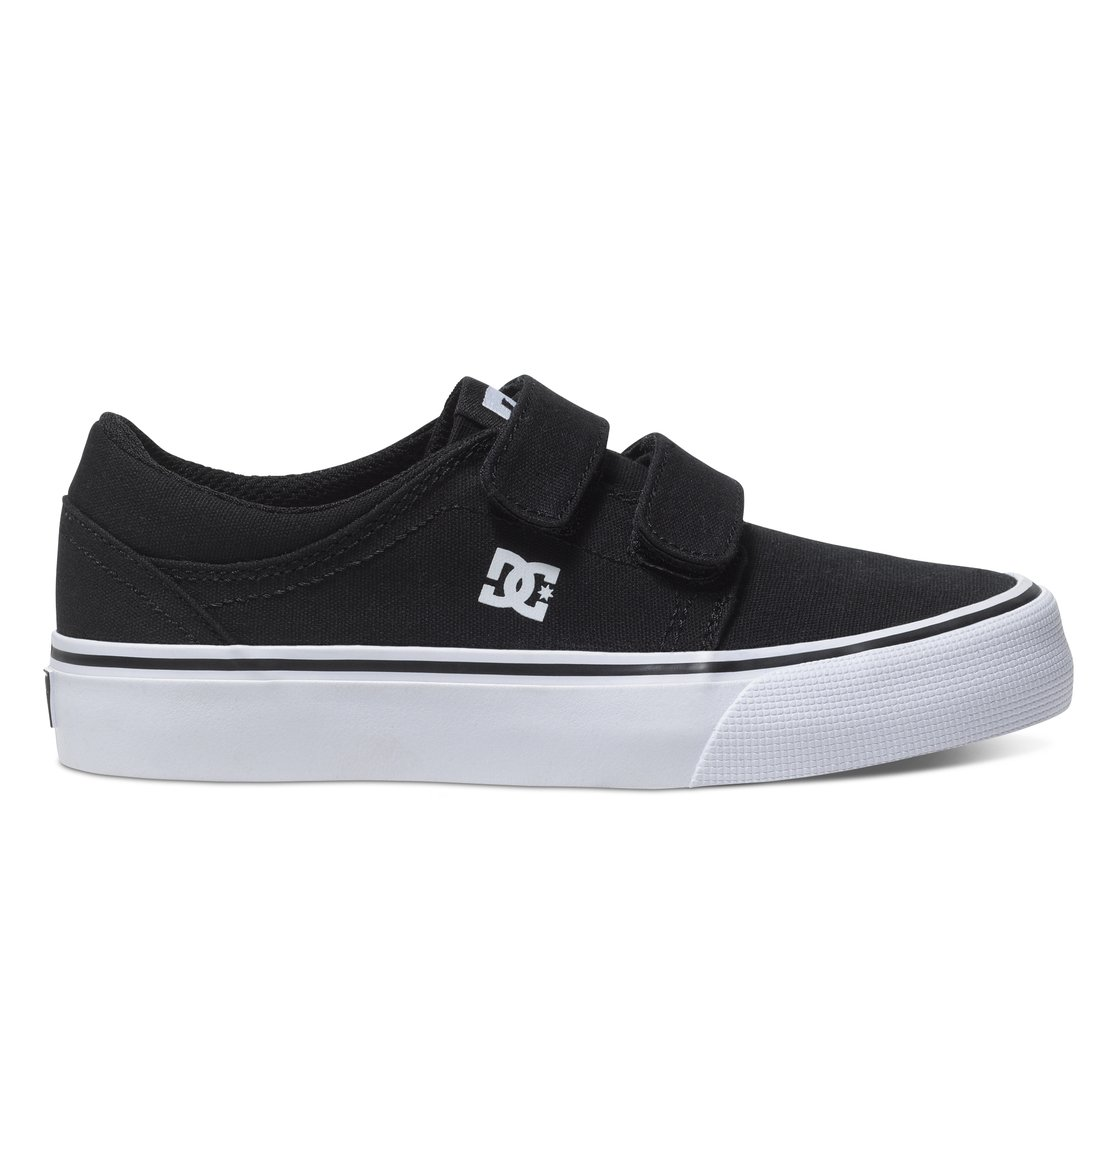 DC Trase V, Sneakers Basses Garçon, Noir (Black/White), 37 EU